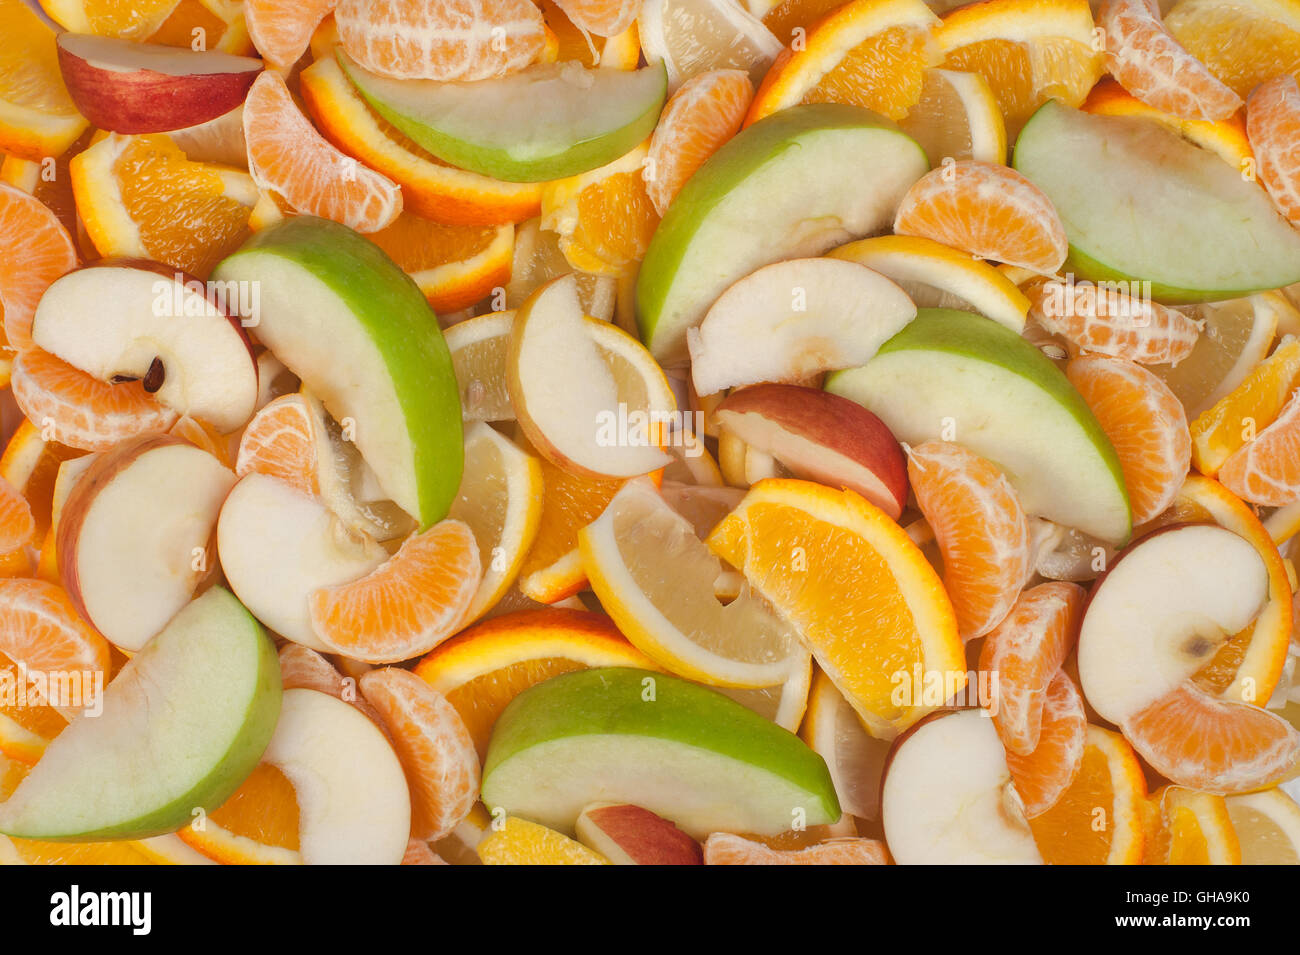 Fondos de frutas - Limón Mandarina Naranja y Apple Imagen De Stock